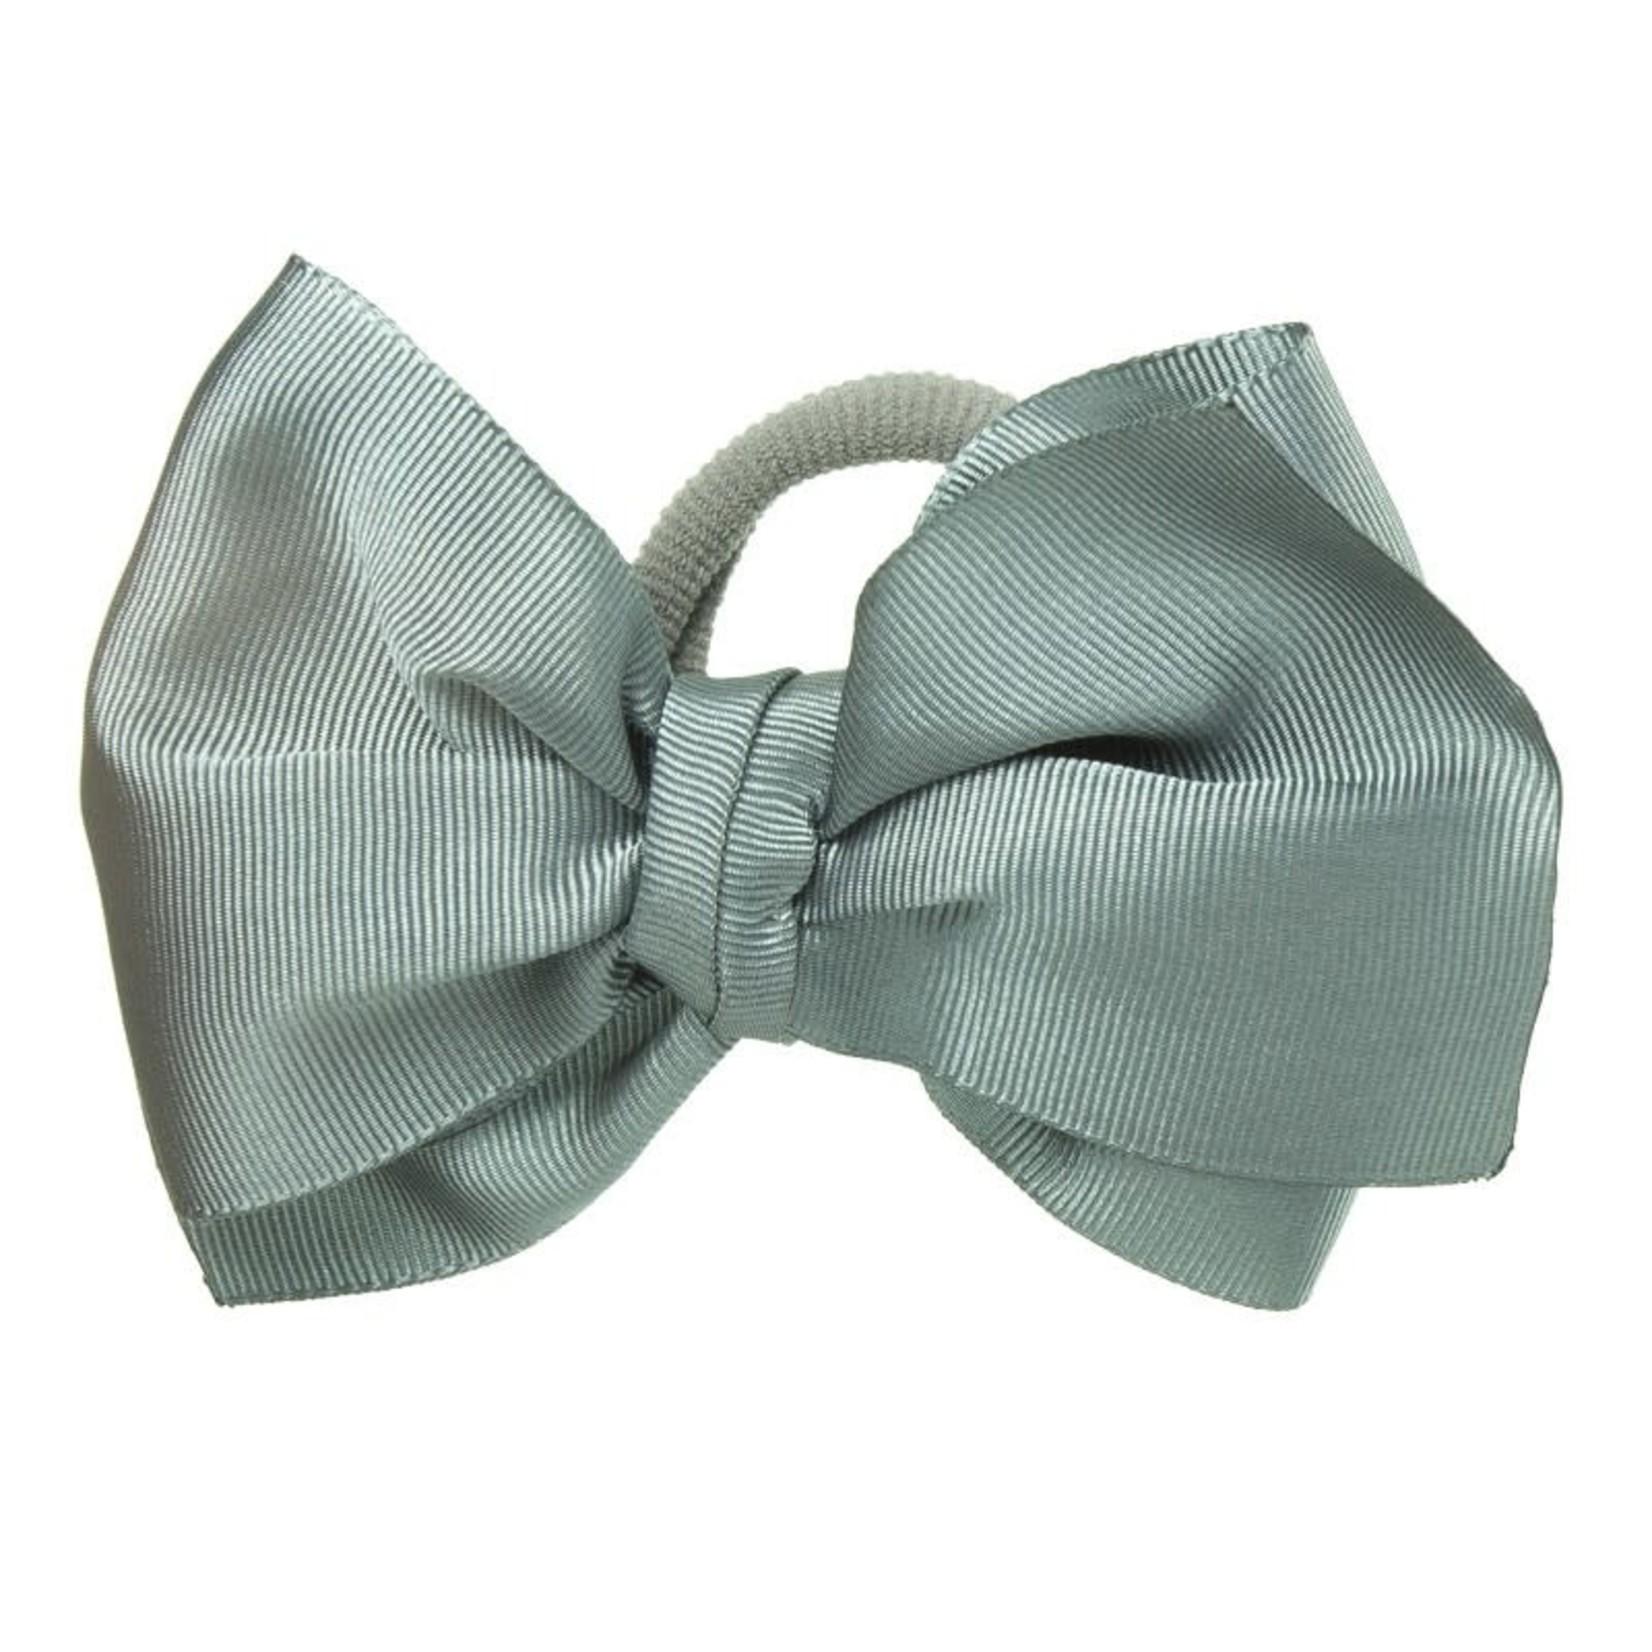 Hair Bow - Gray